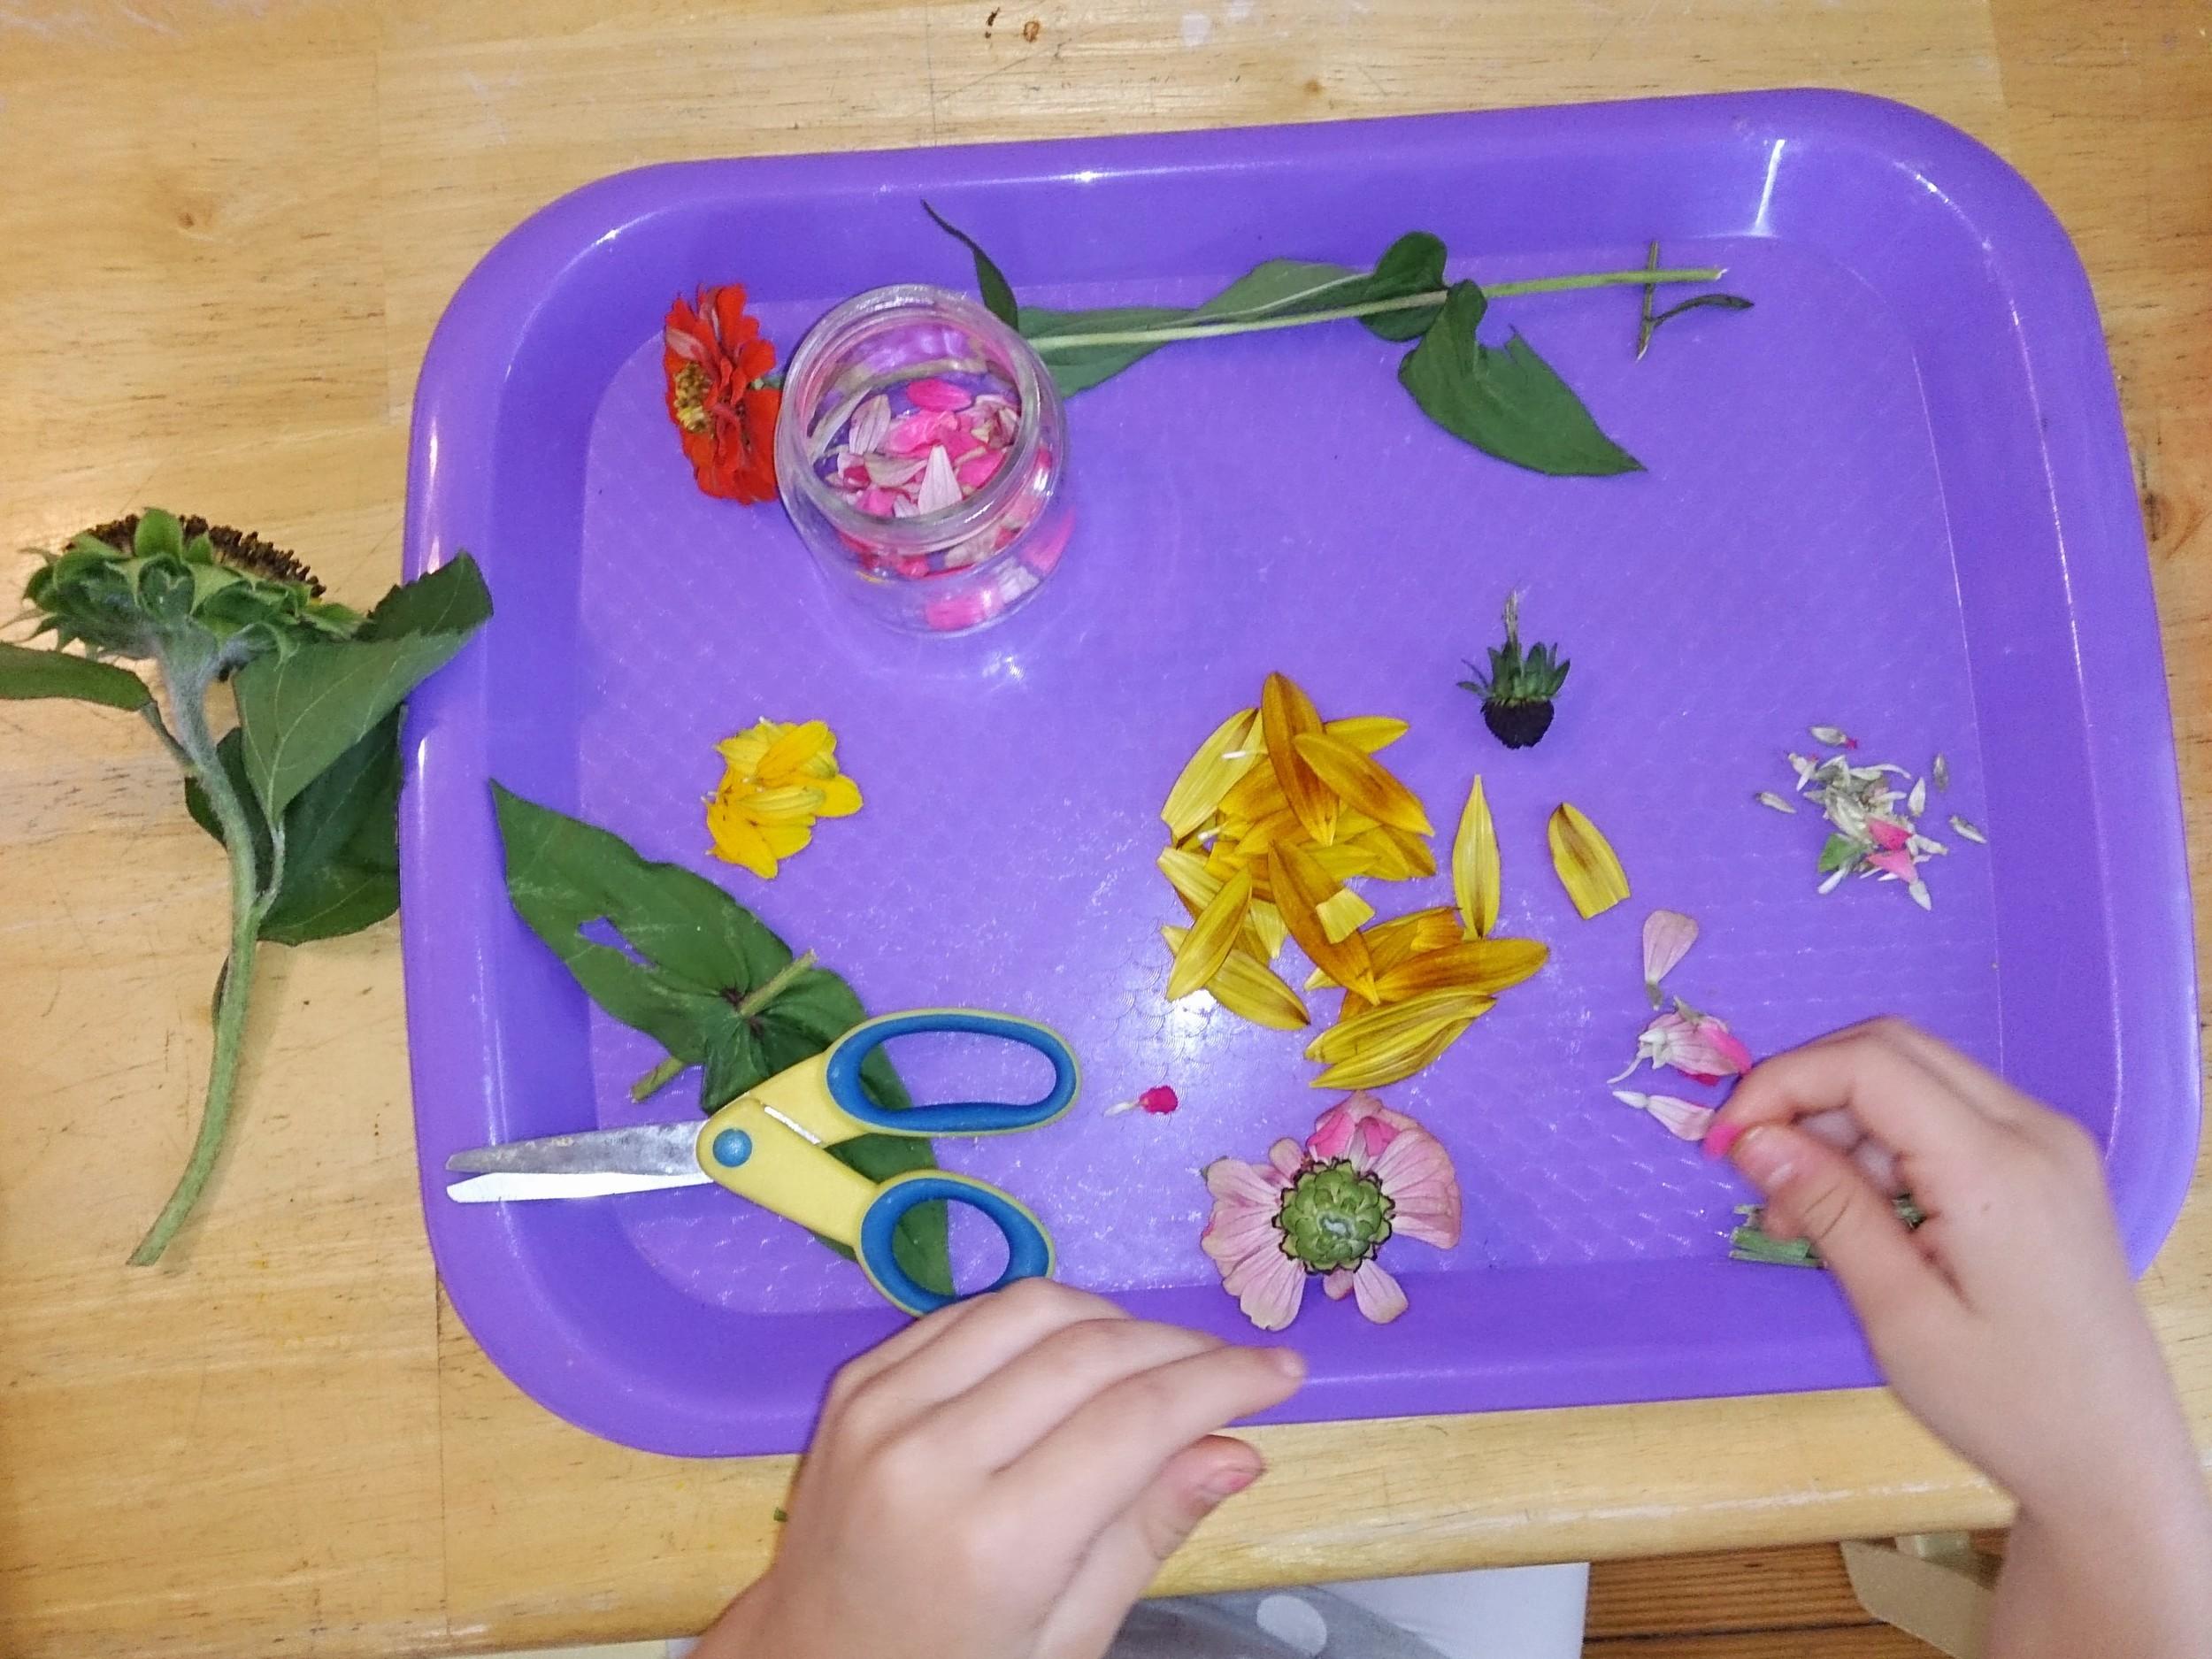 Flower Cutting Station